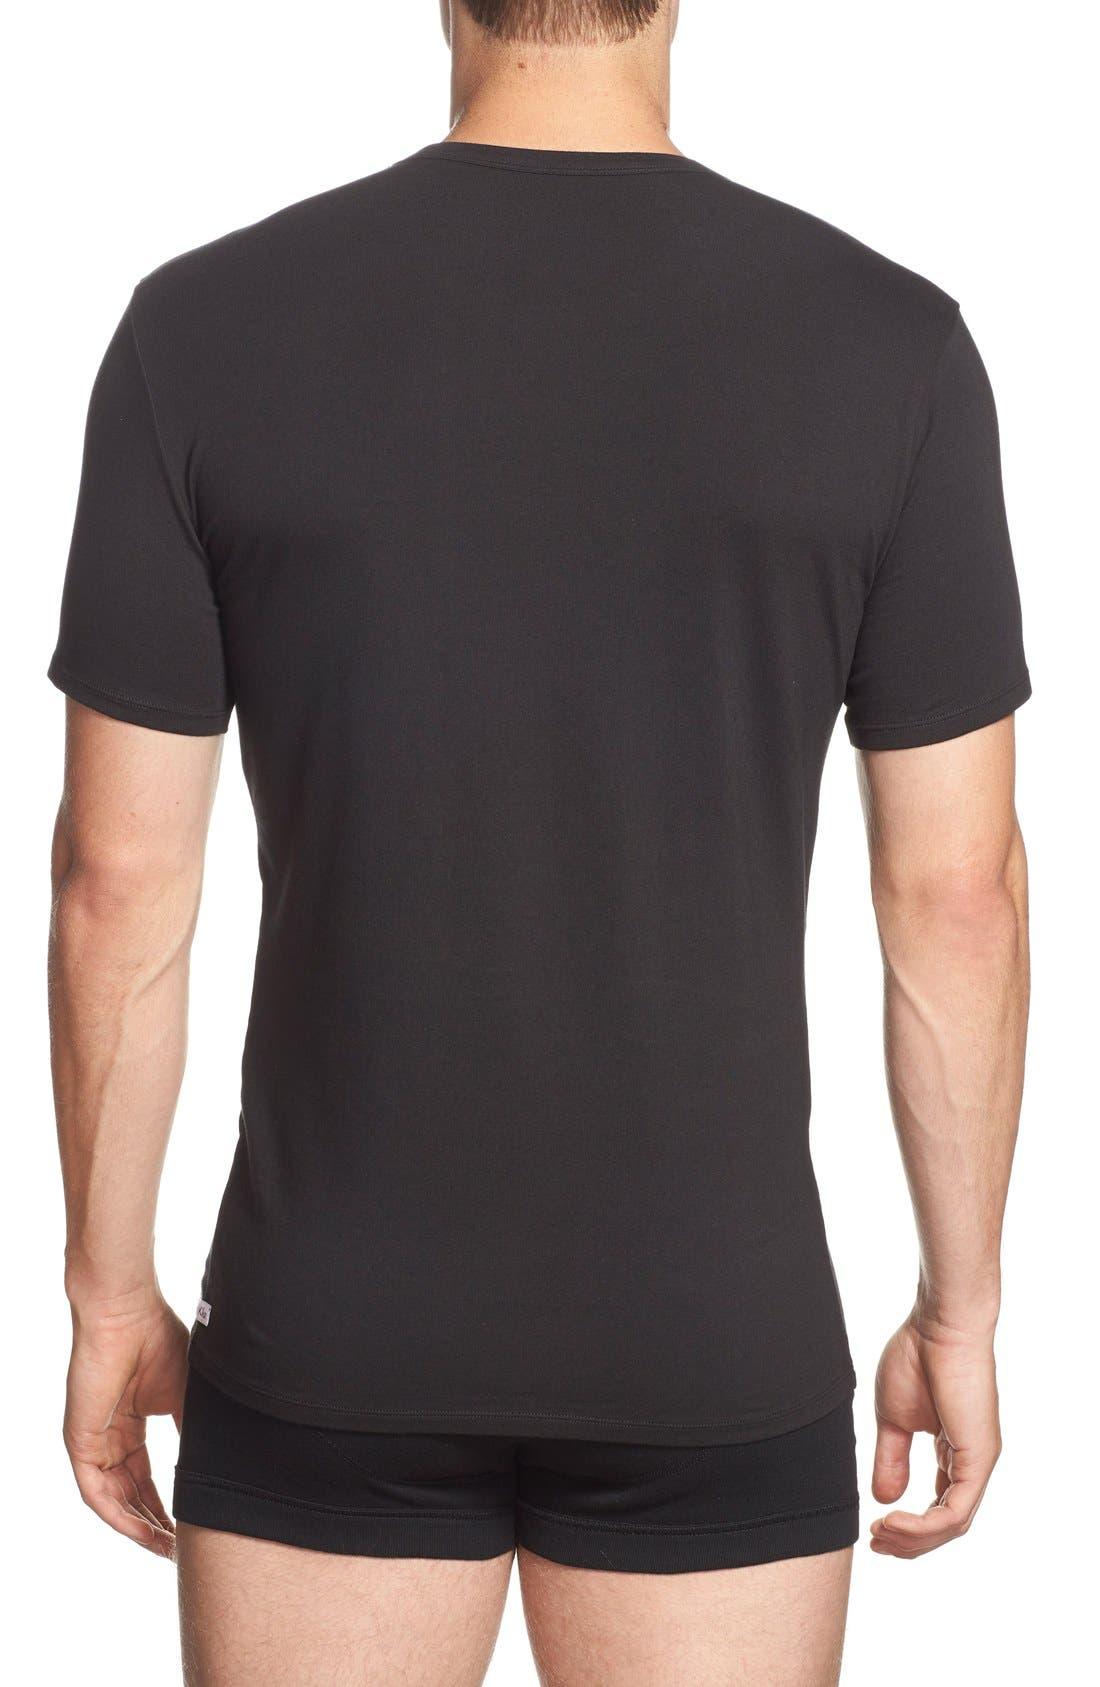 Alternate Image 2  - Calvin Klein 2-Pack Stretch Cotton Crewneck T-Shirt